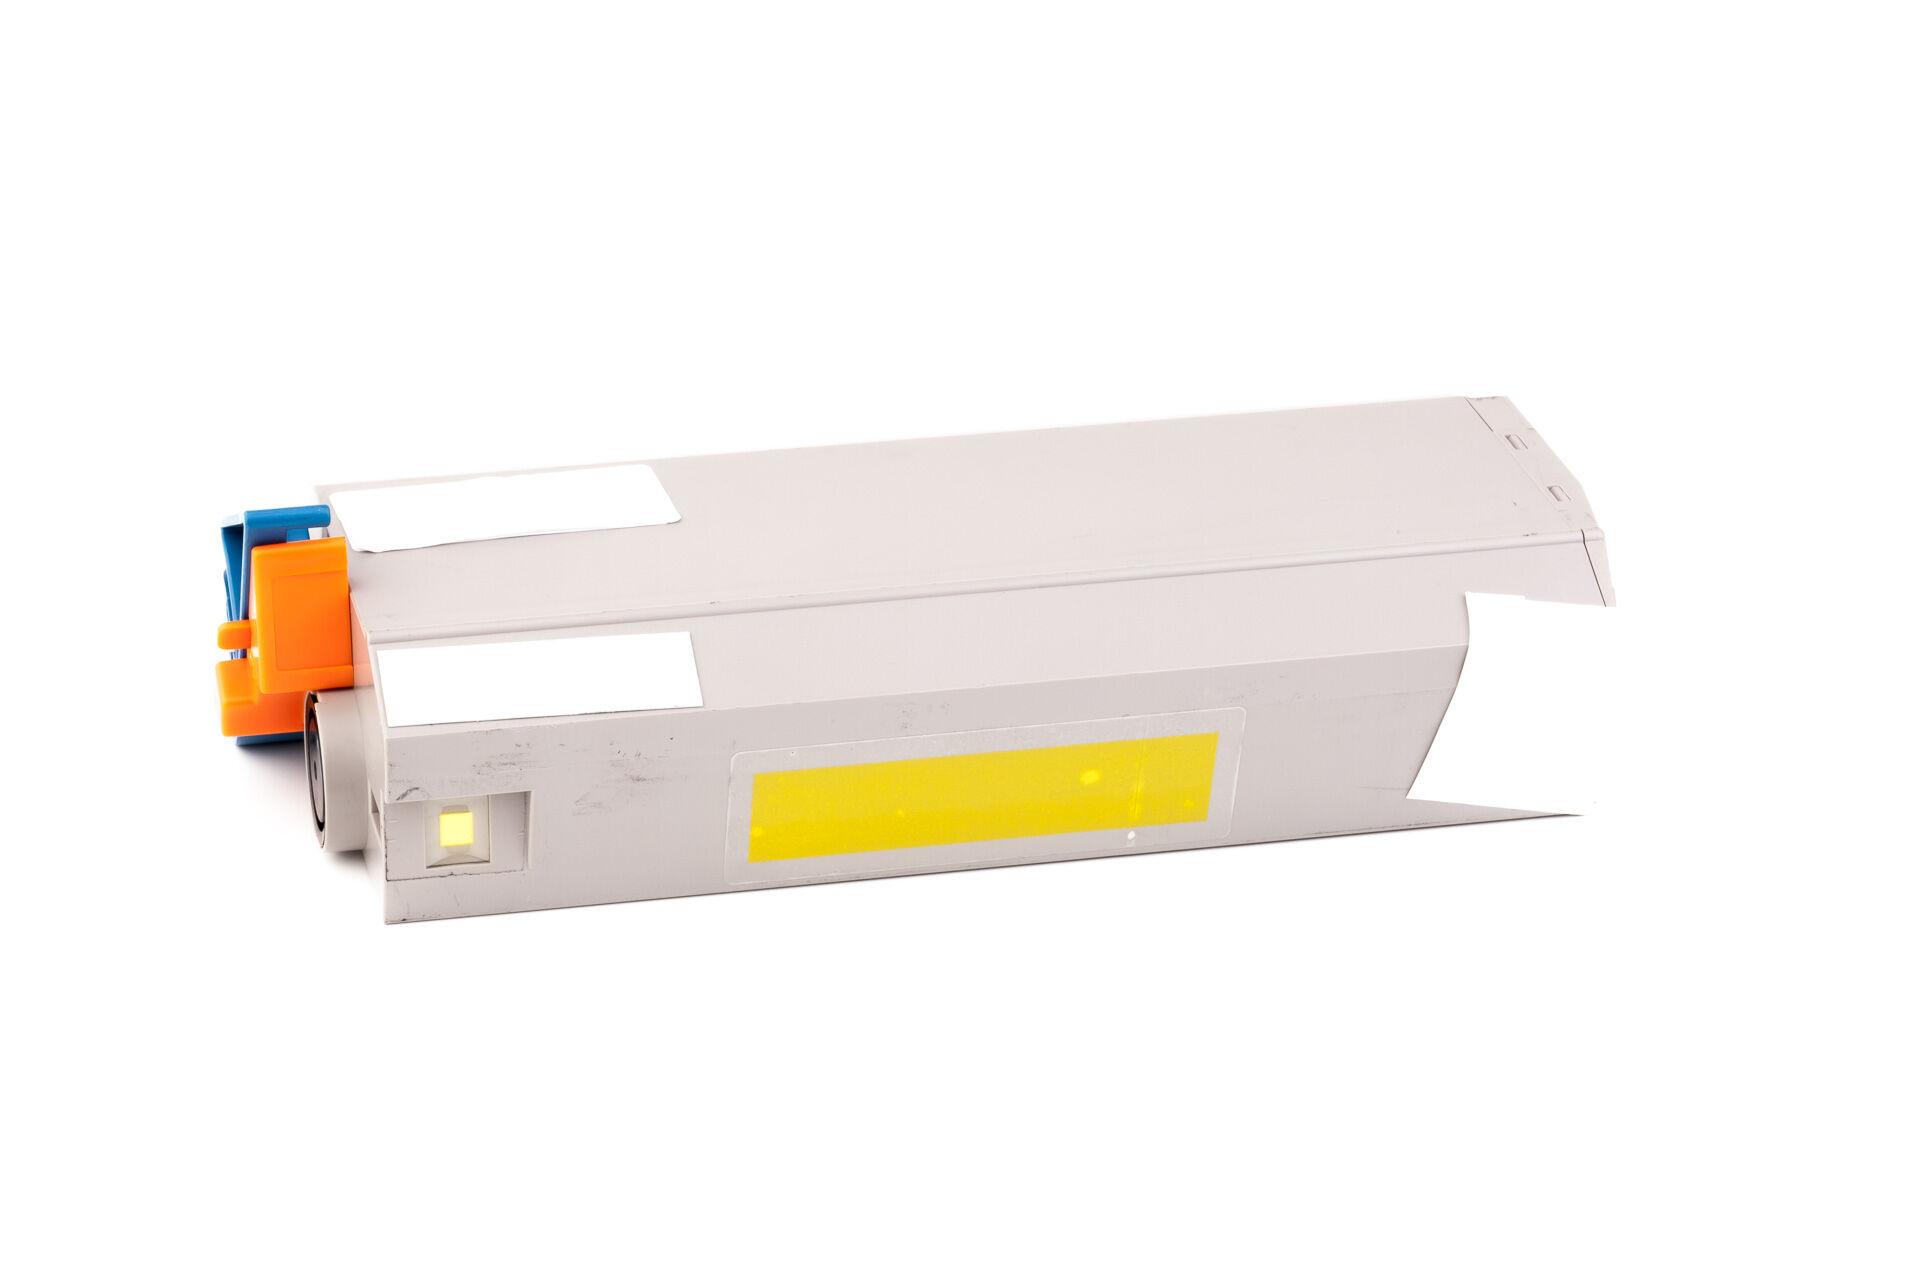 OKI Cartouche de Toner pour OKI 41963007 cyan compatible (de marque ASC)